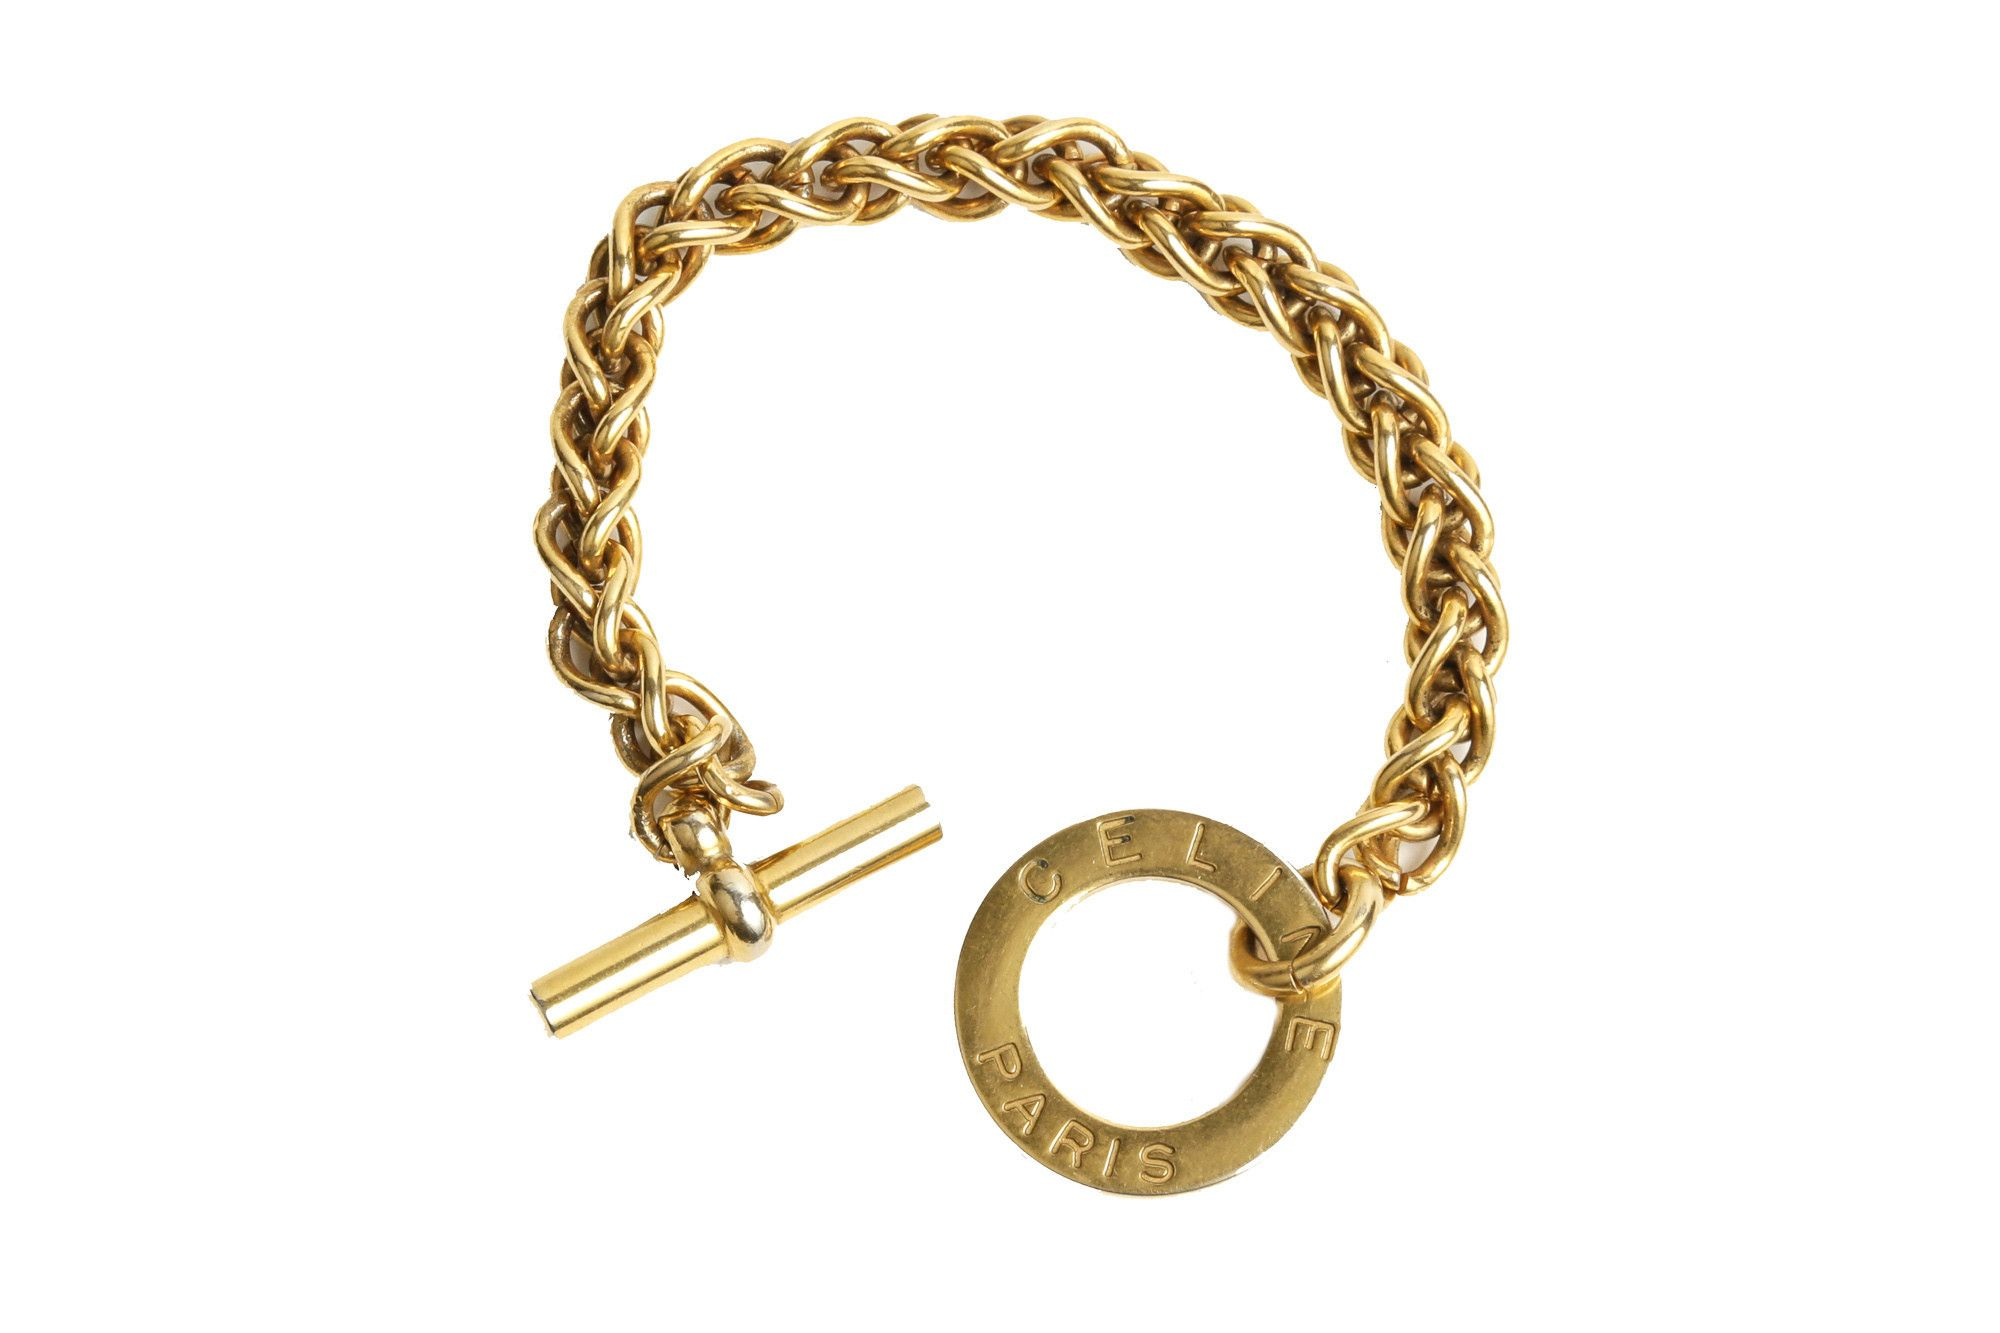 Vintage Celine Cle 008 Bracelet In 2020 Vintage Jewelry Vintage Bracelets